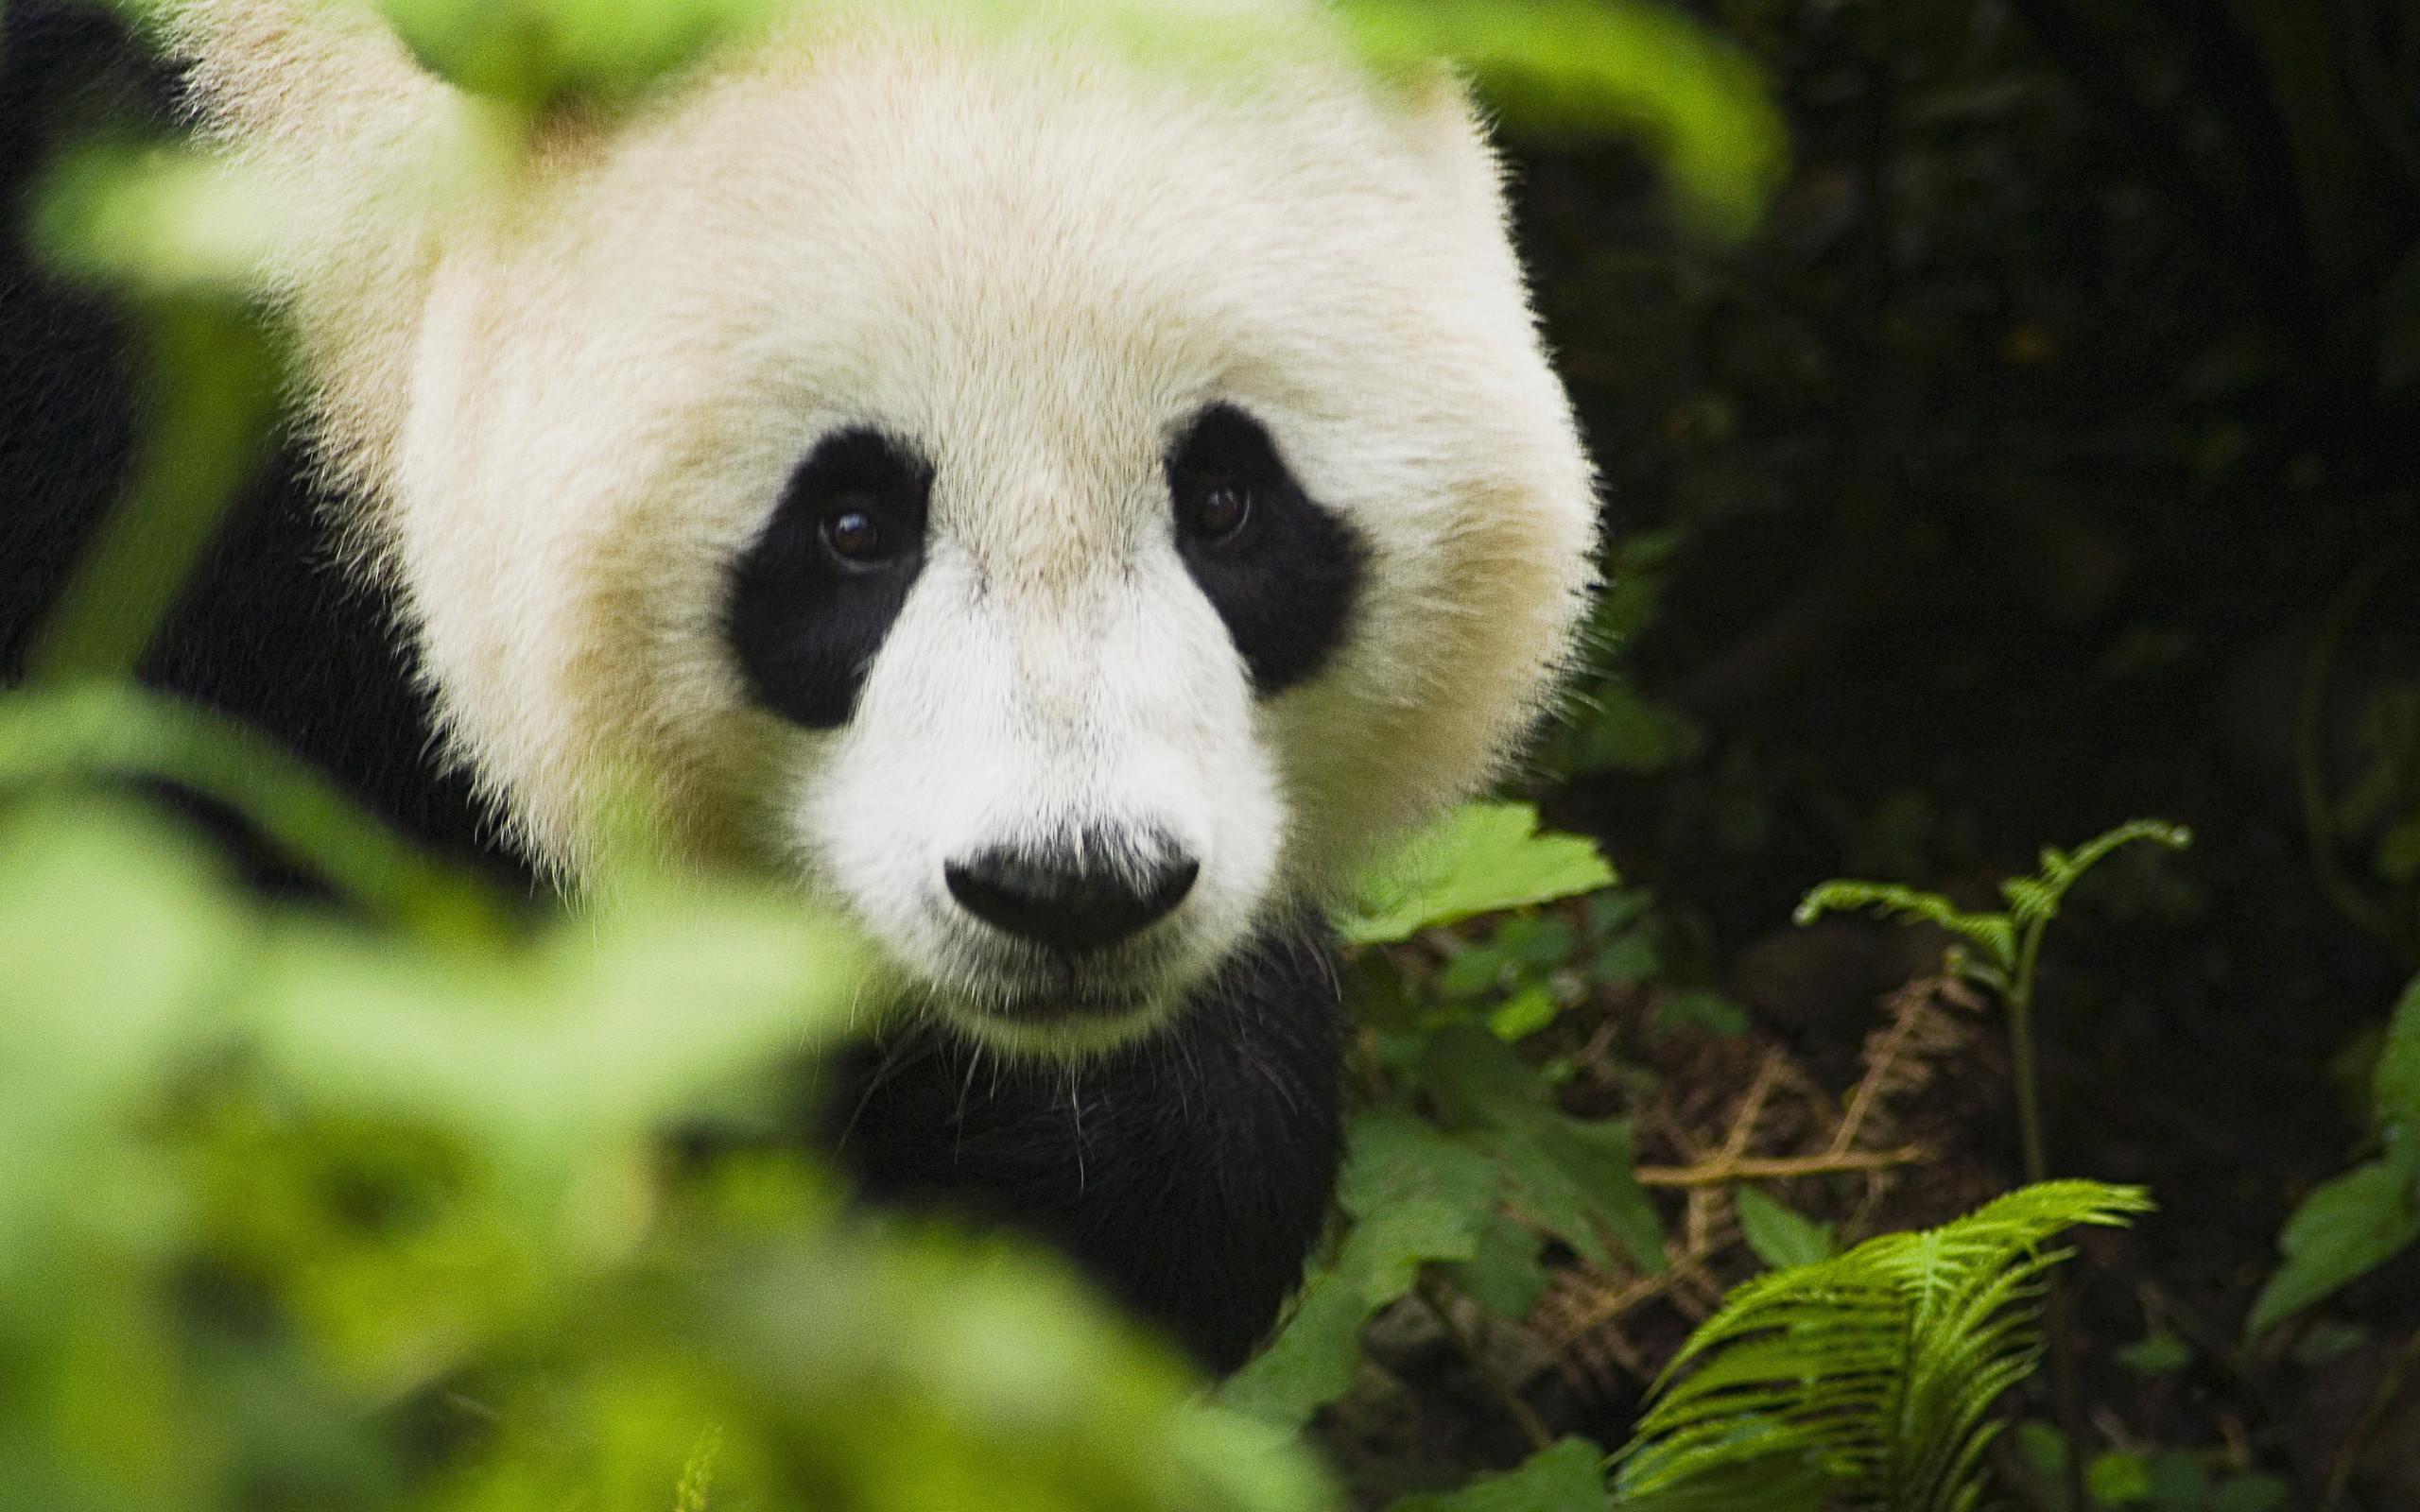 Cute Panda Face Wallpaper IPhone Wallpaper WallpaperLepi 2560x1600